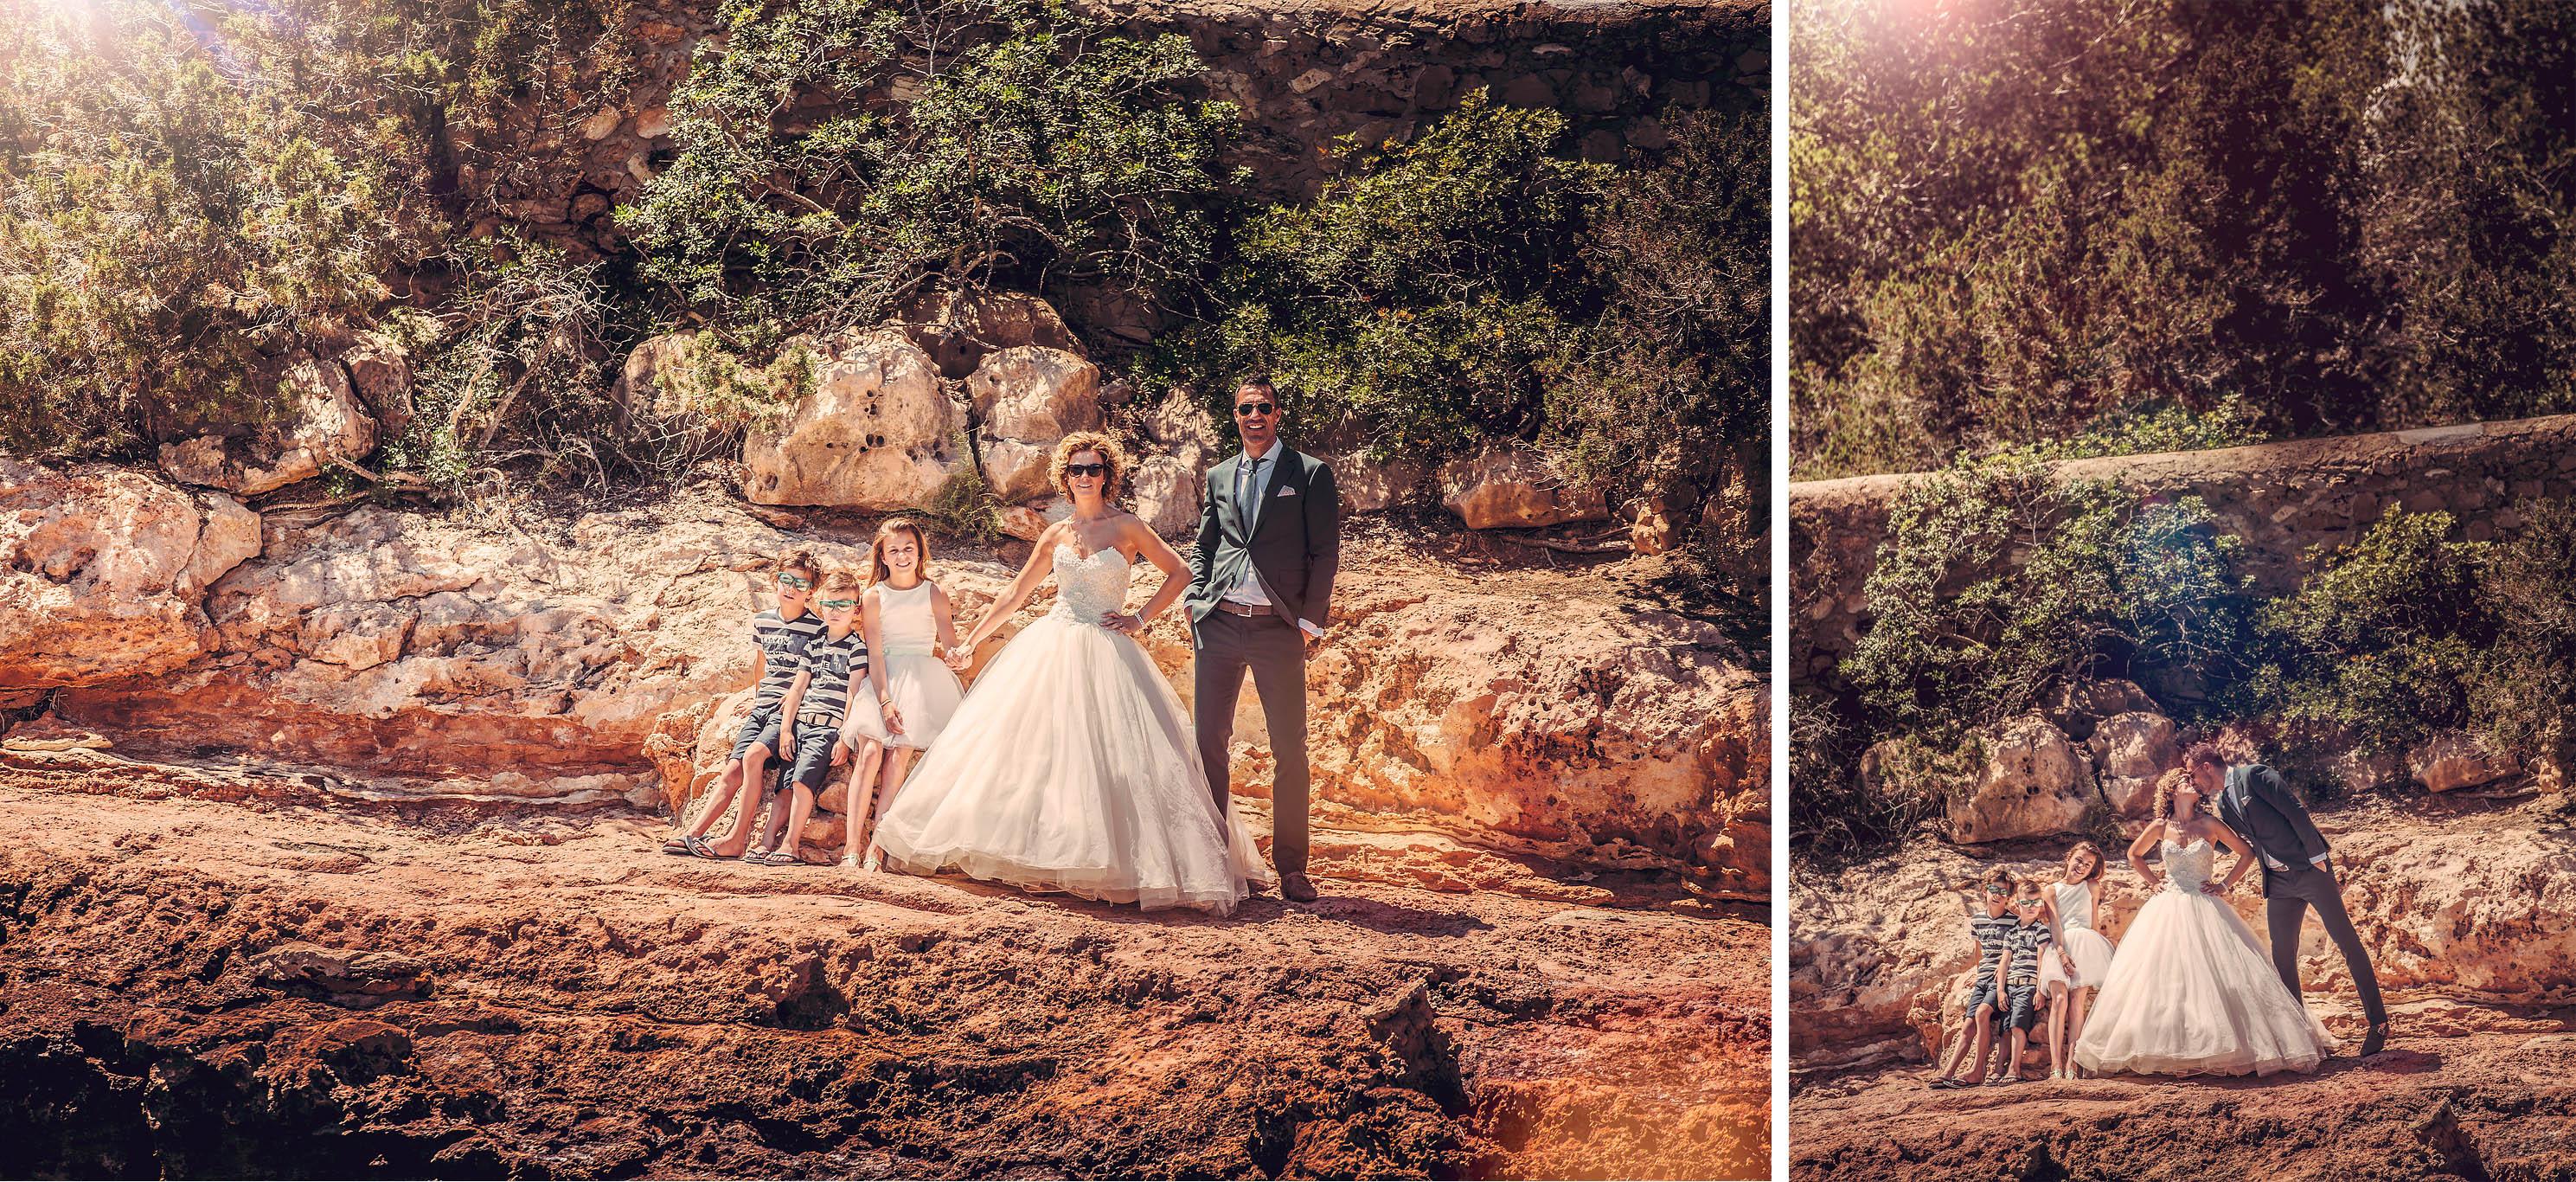 Bruidsreportage Destination Wedding Ibiza Mandy en Joost 017 - Bas Driessen Fotografie